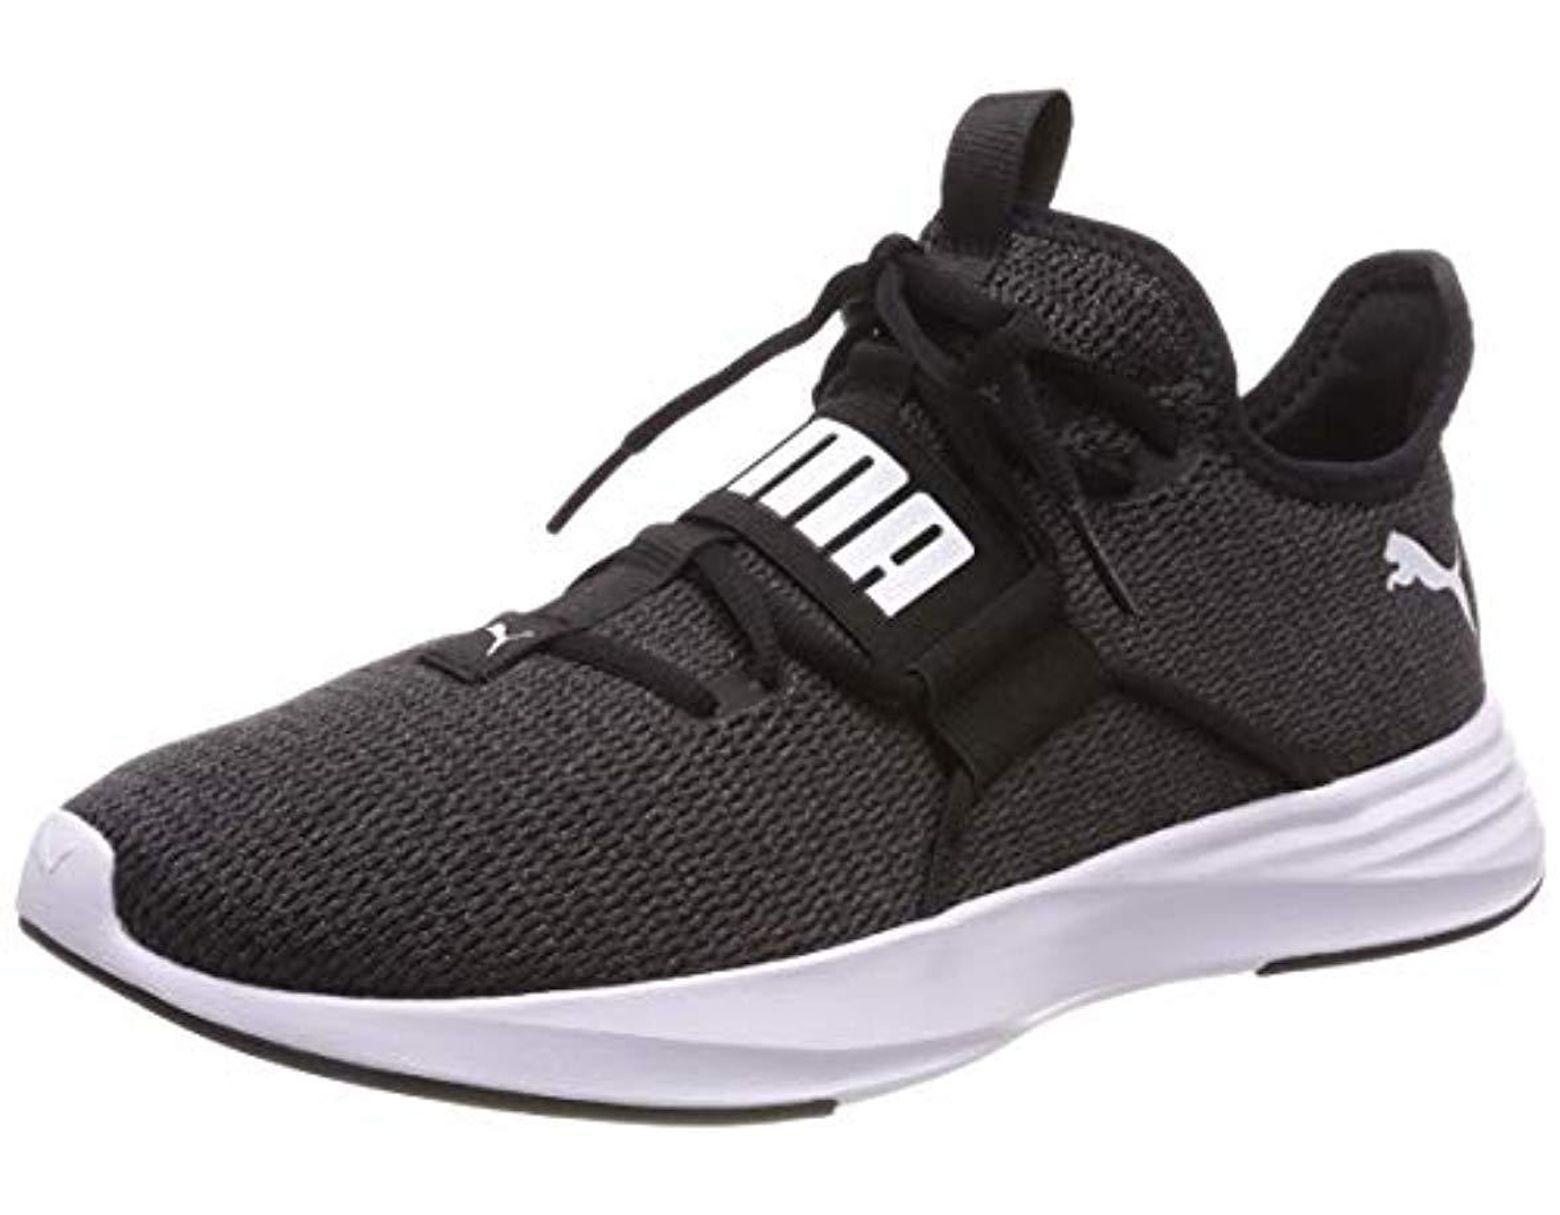 f5dbdbc357044 Men's Black Persist Xt Fitness Shoes